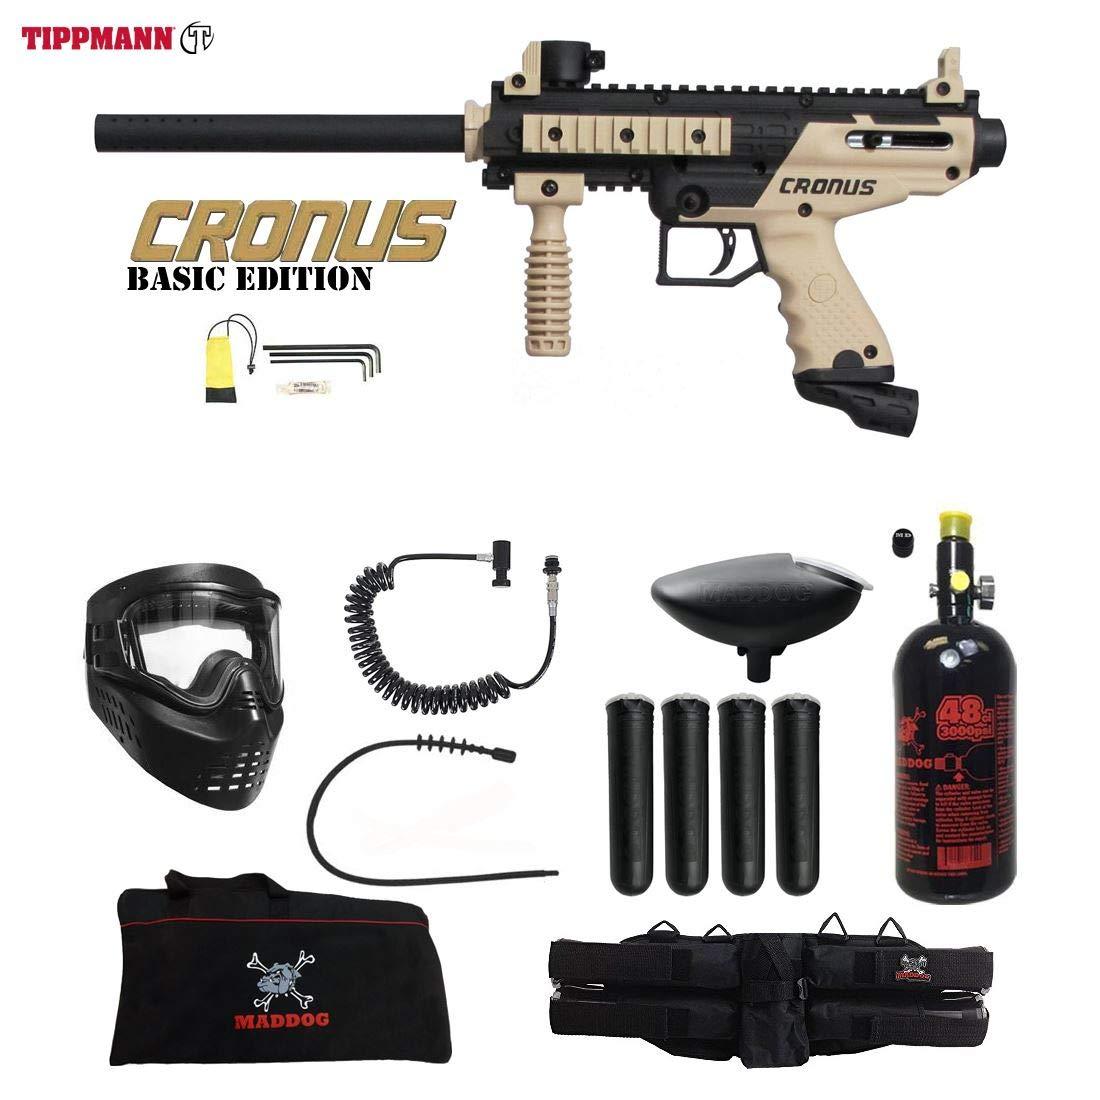 Maddog Tippmann Cronus Basic Tactical Specialist HPA Paintball Gun Package - Black/Tan by Maddog